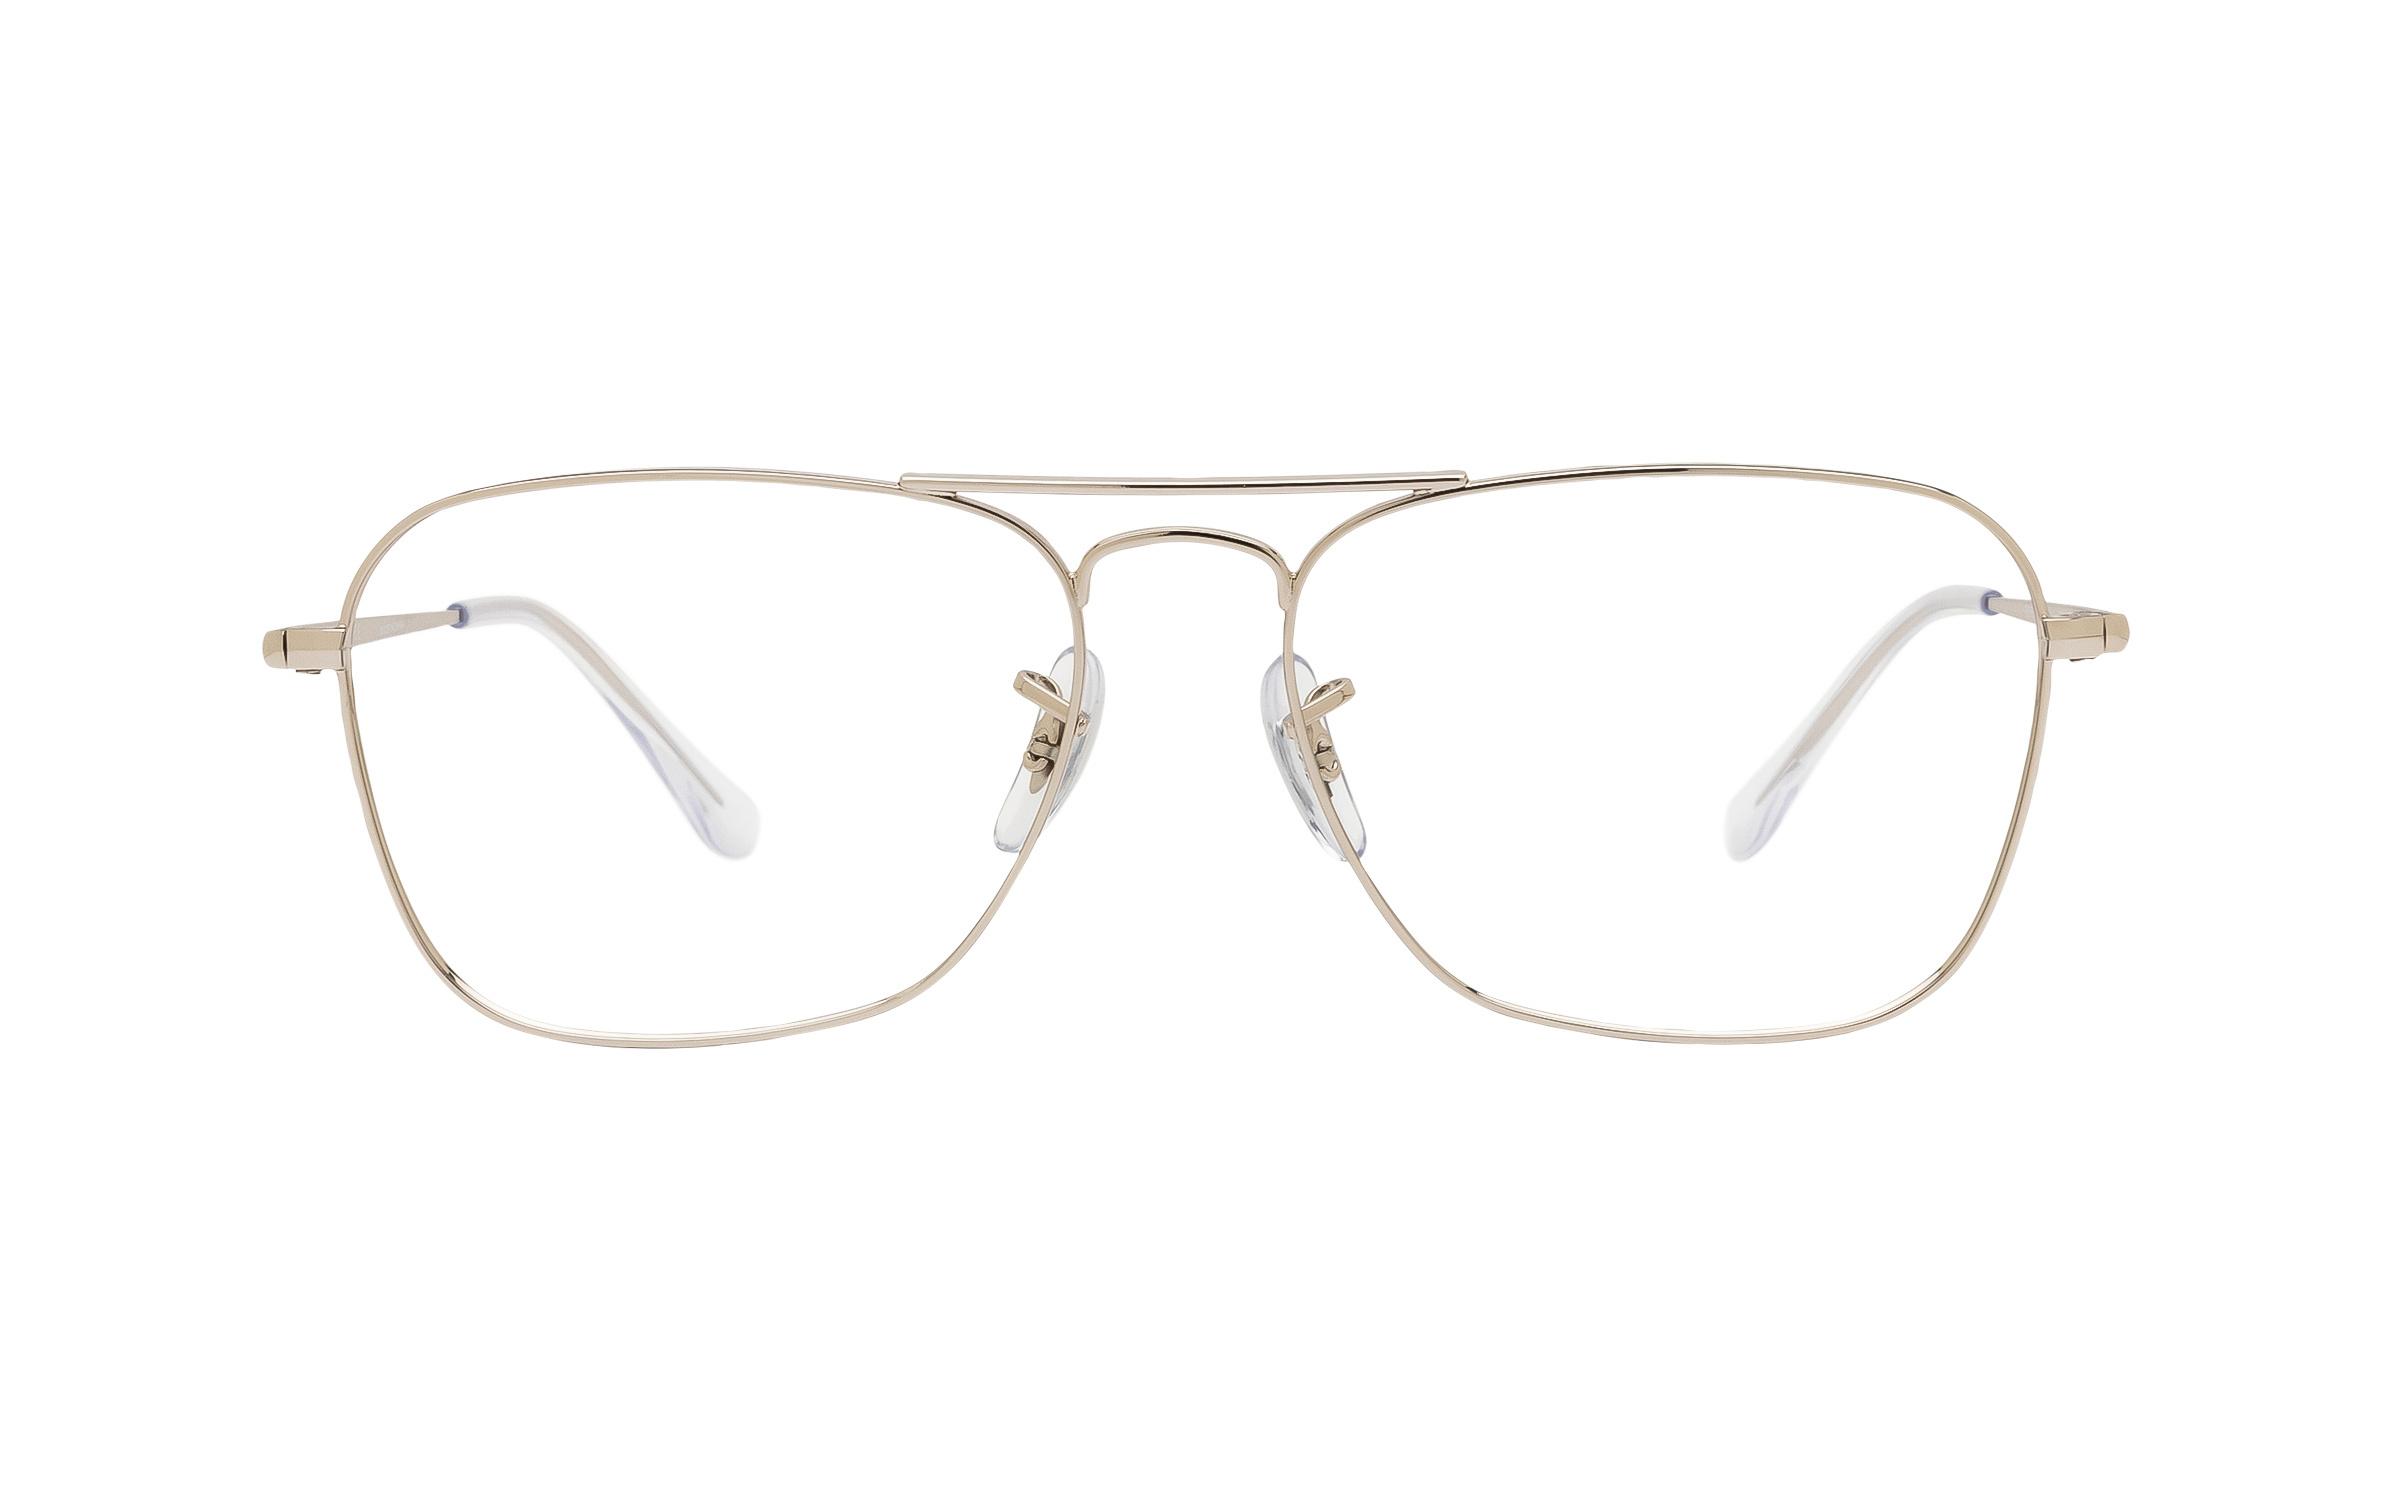 http://www.coastal.com/ - Ray-Ban Caravan II RX6536 2501 (55) Eyeglasses and Frame in Silver – Online Coastal